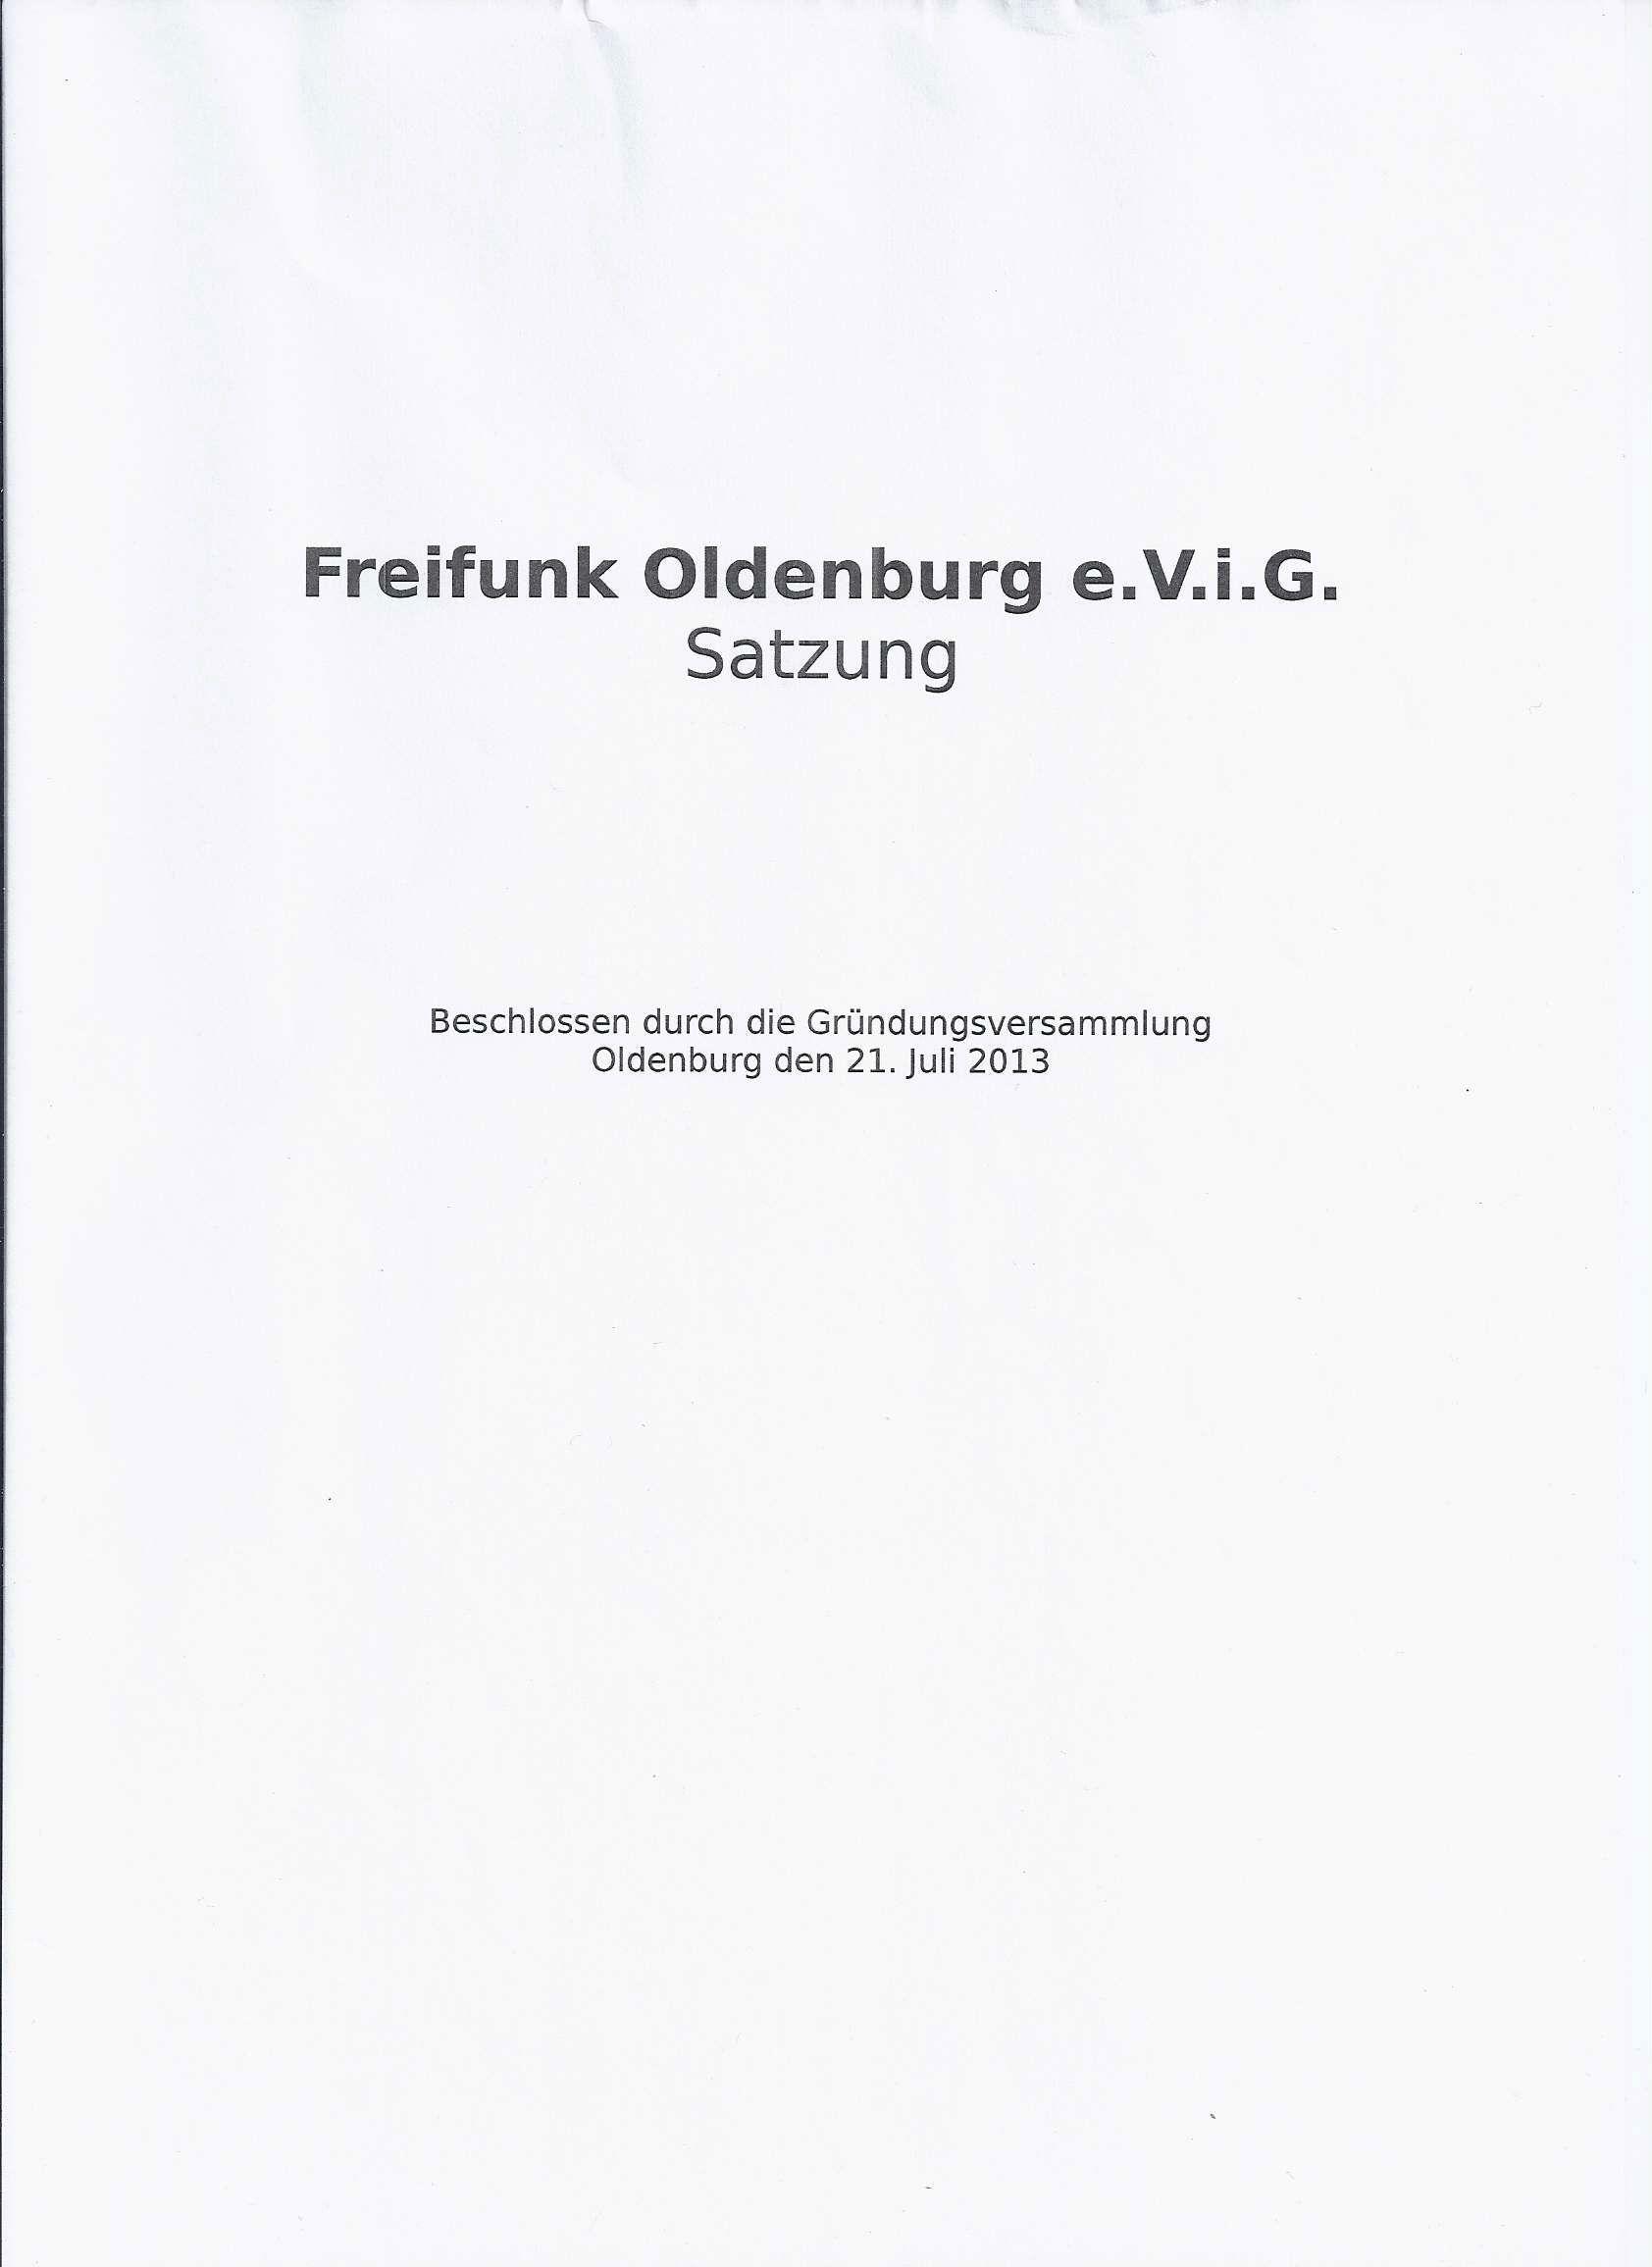 Satzung/Gründungssatzung/verein_freifunk_oldenburg_satzung_0001.jpg